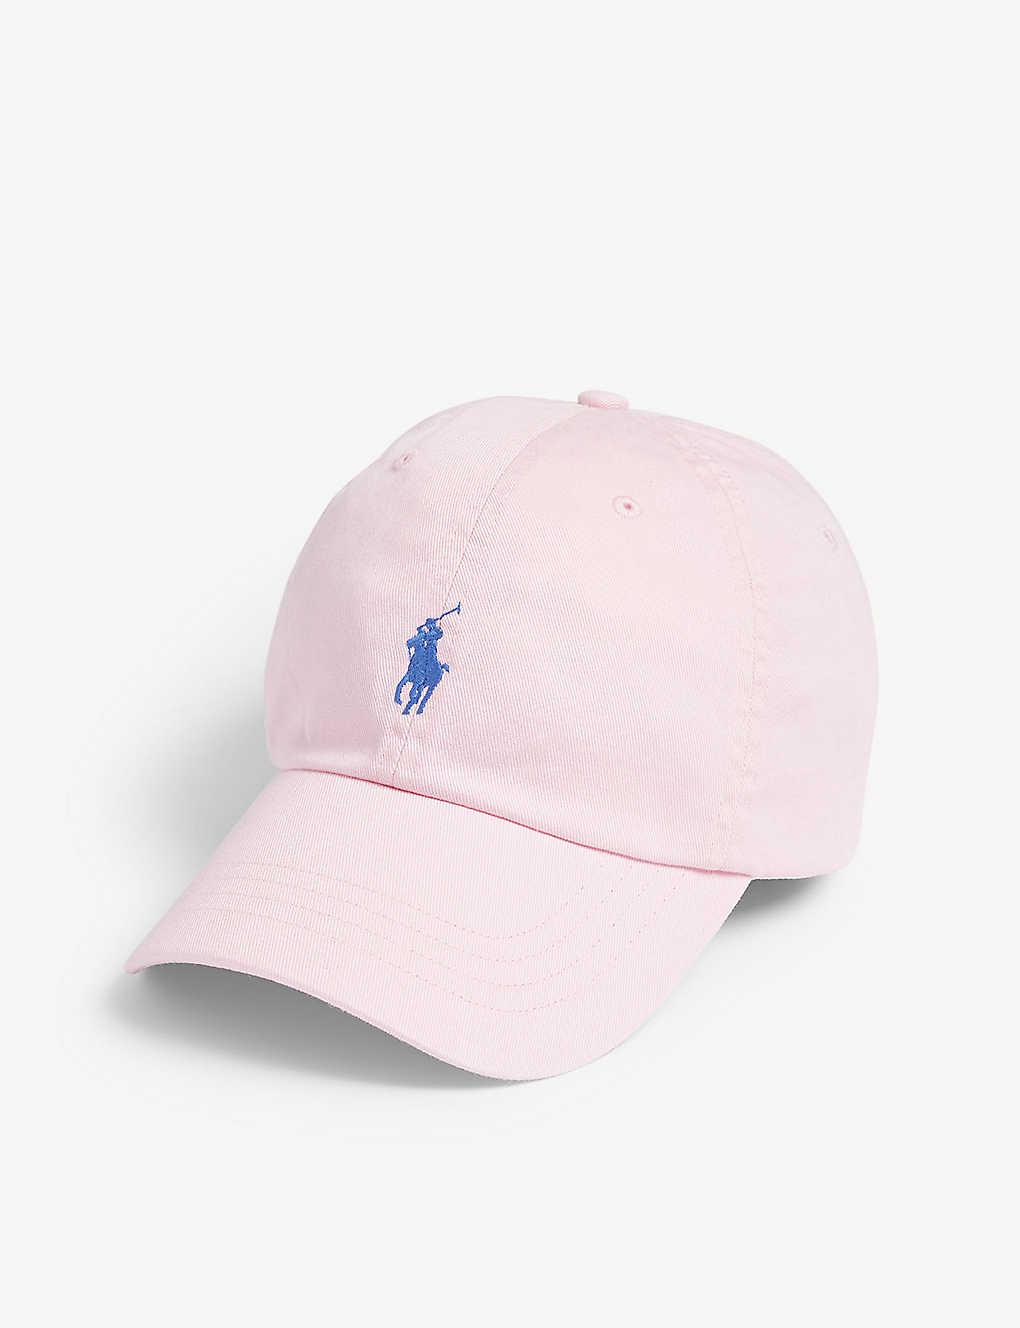 176998b0 POLO RALPH LAUREN - Pony baseball cap | Selfridges.com